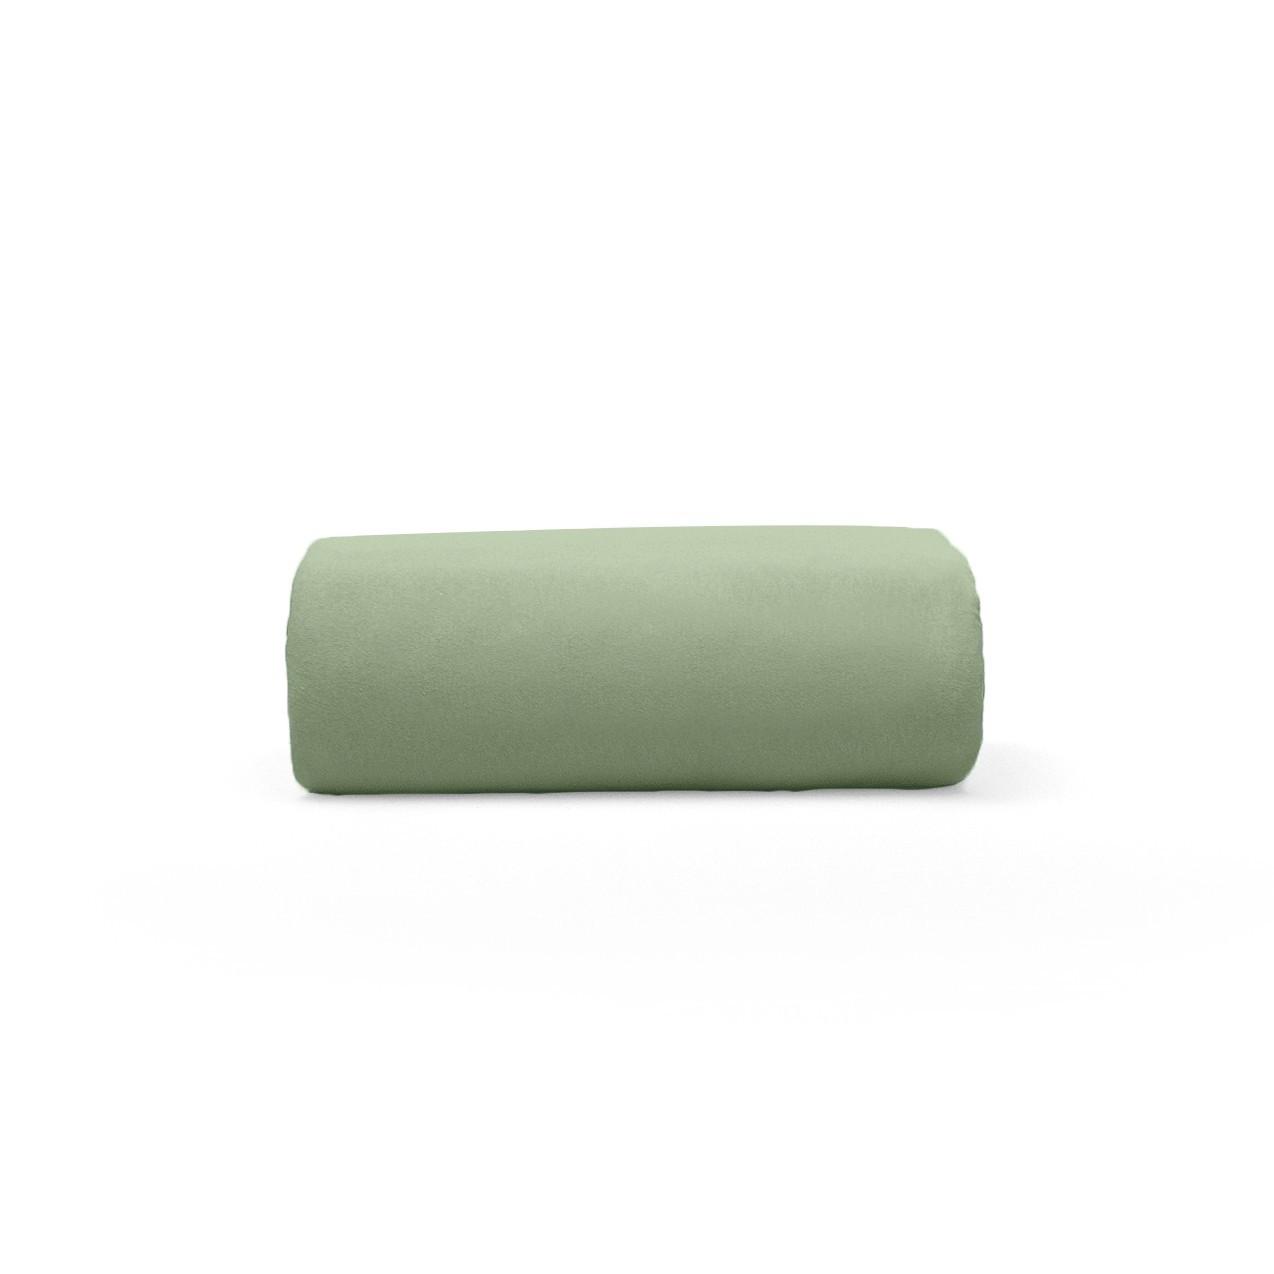 Lencol Malha Casal Art Premium com Elastico 100 algodao Verde - Buettner